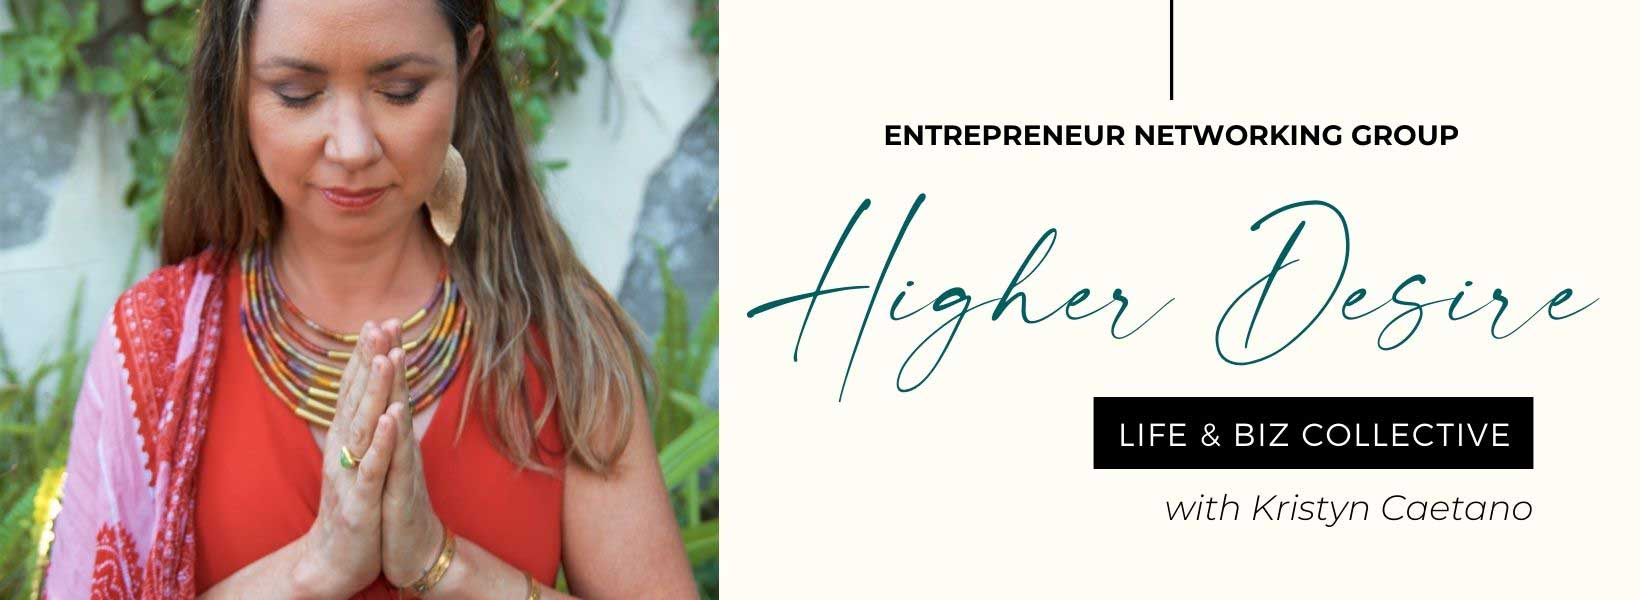 entrepreneur networking group